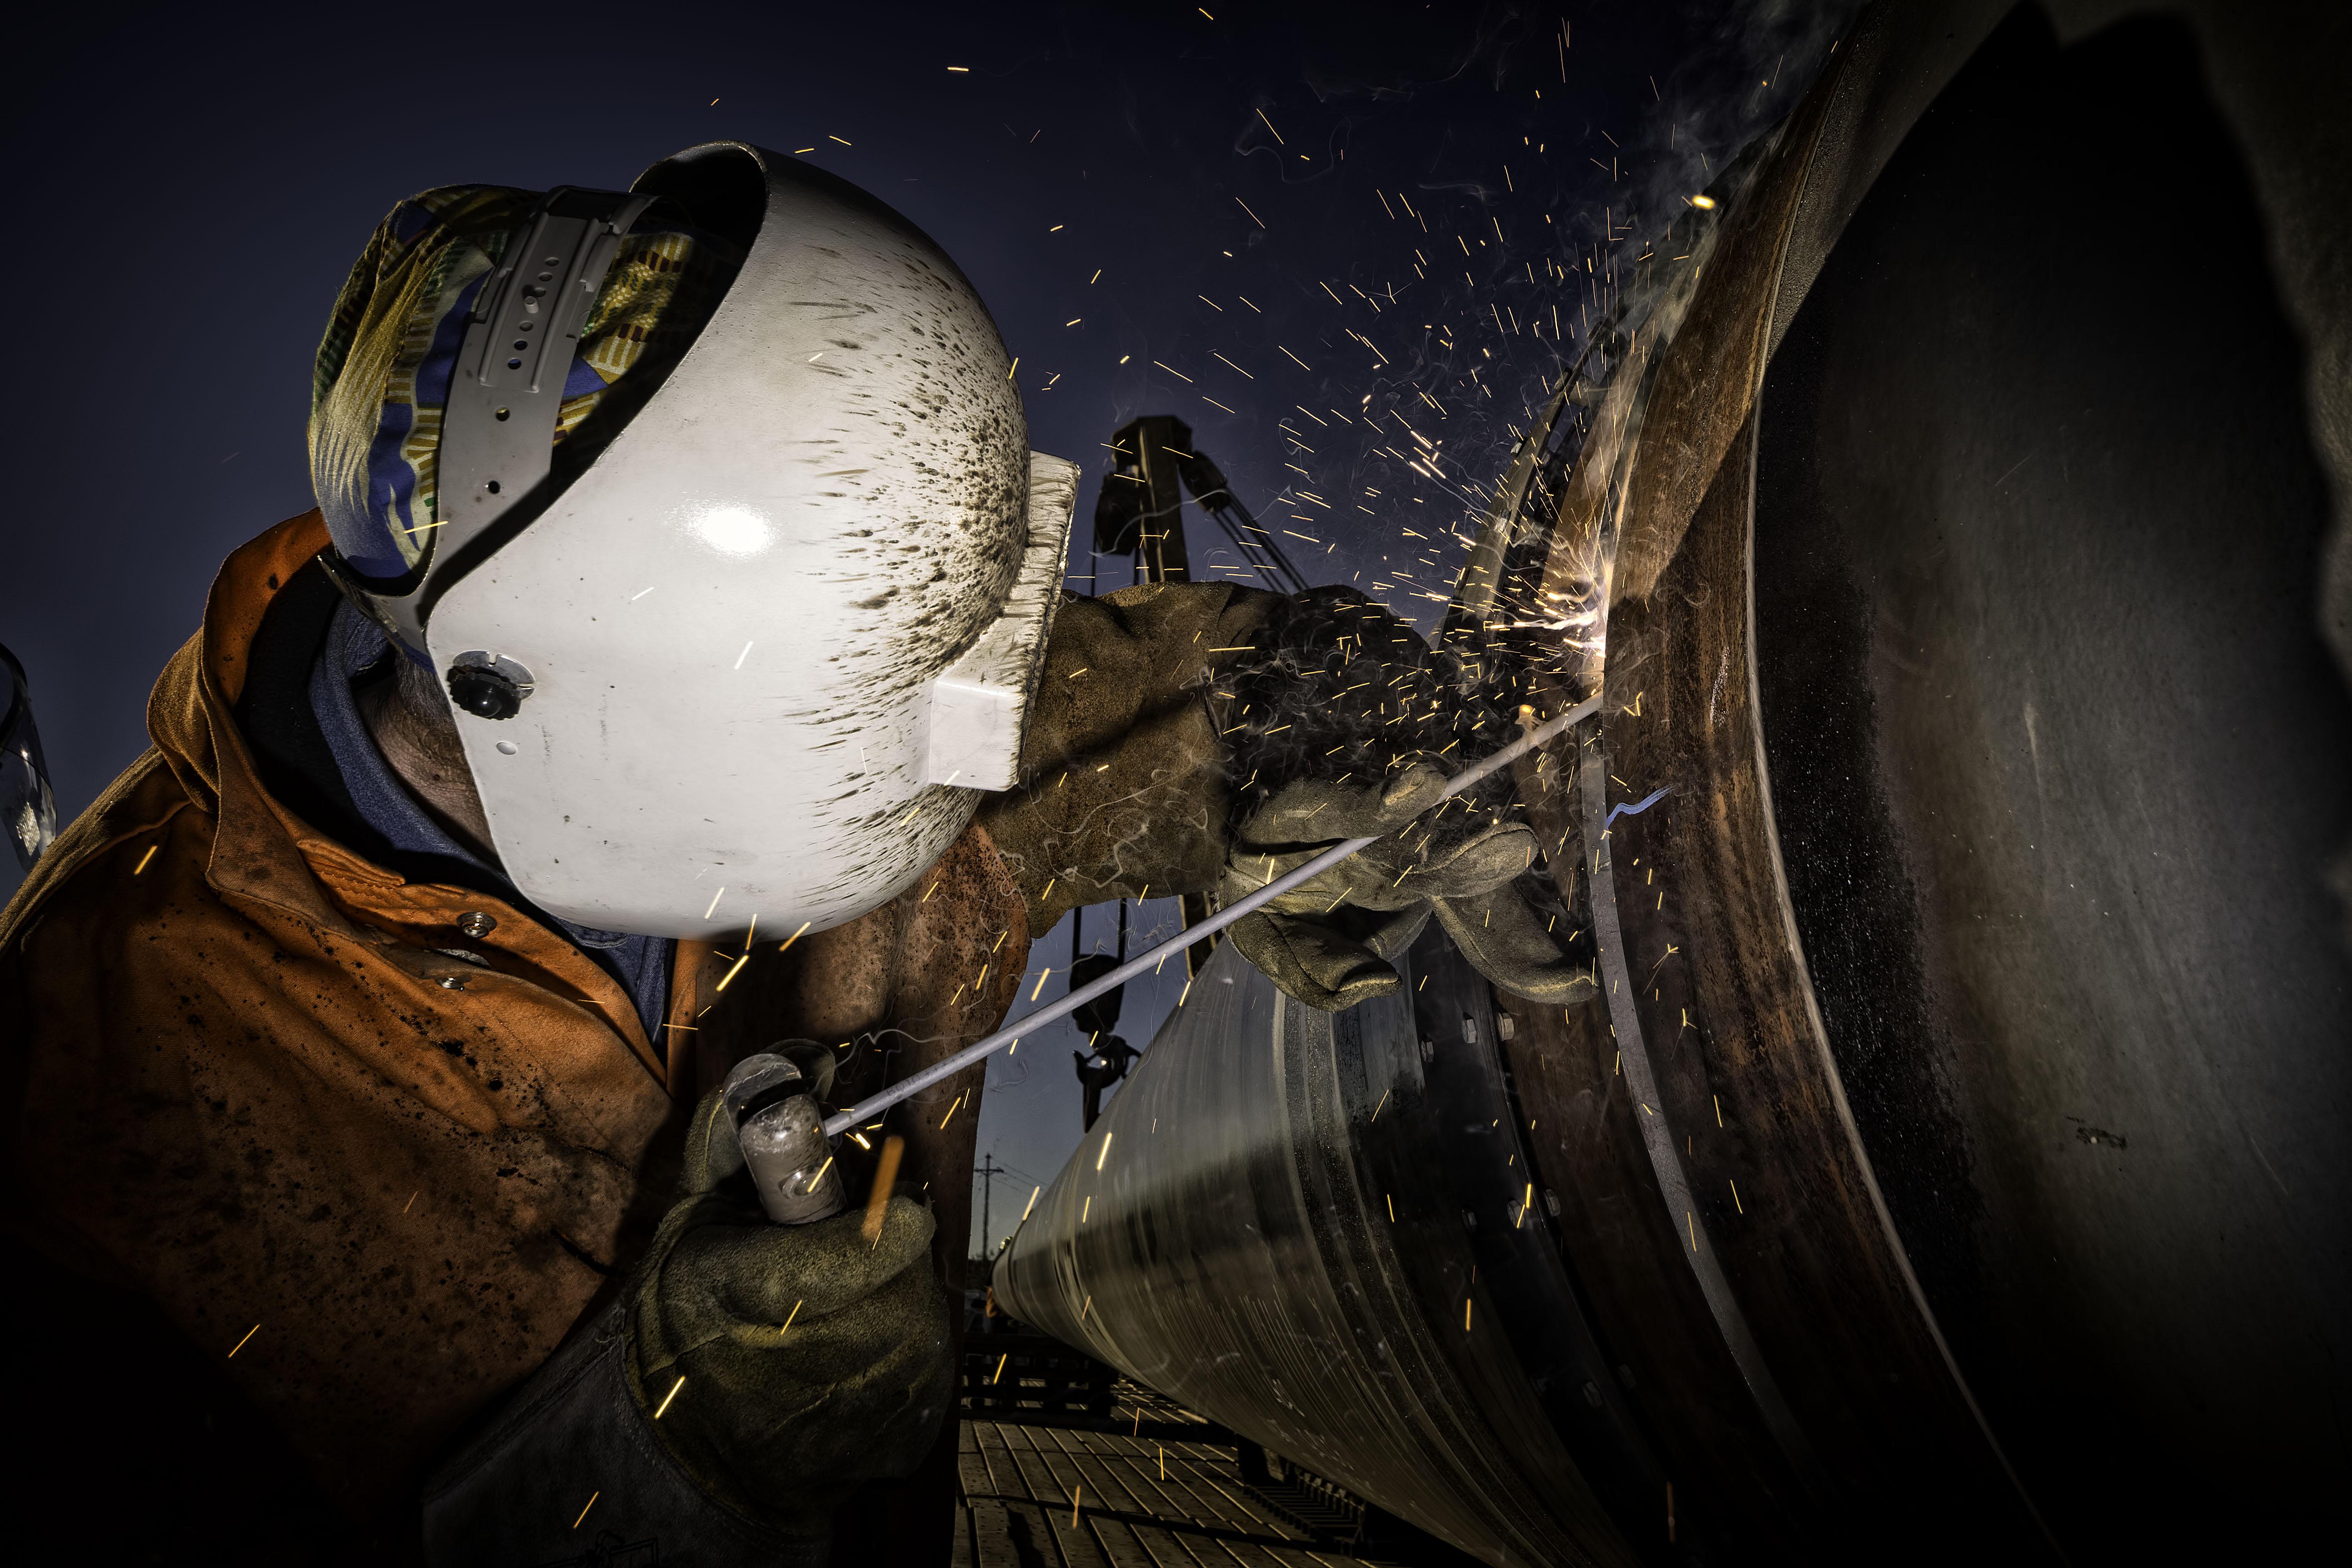 Pipeline Photography 14